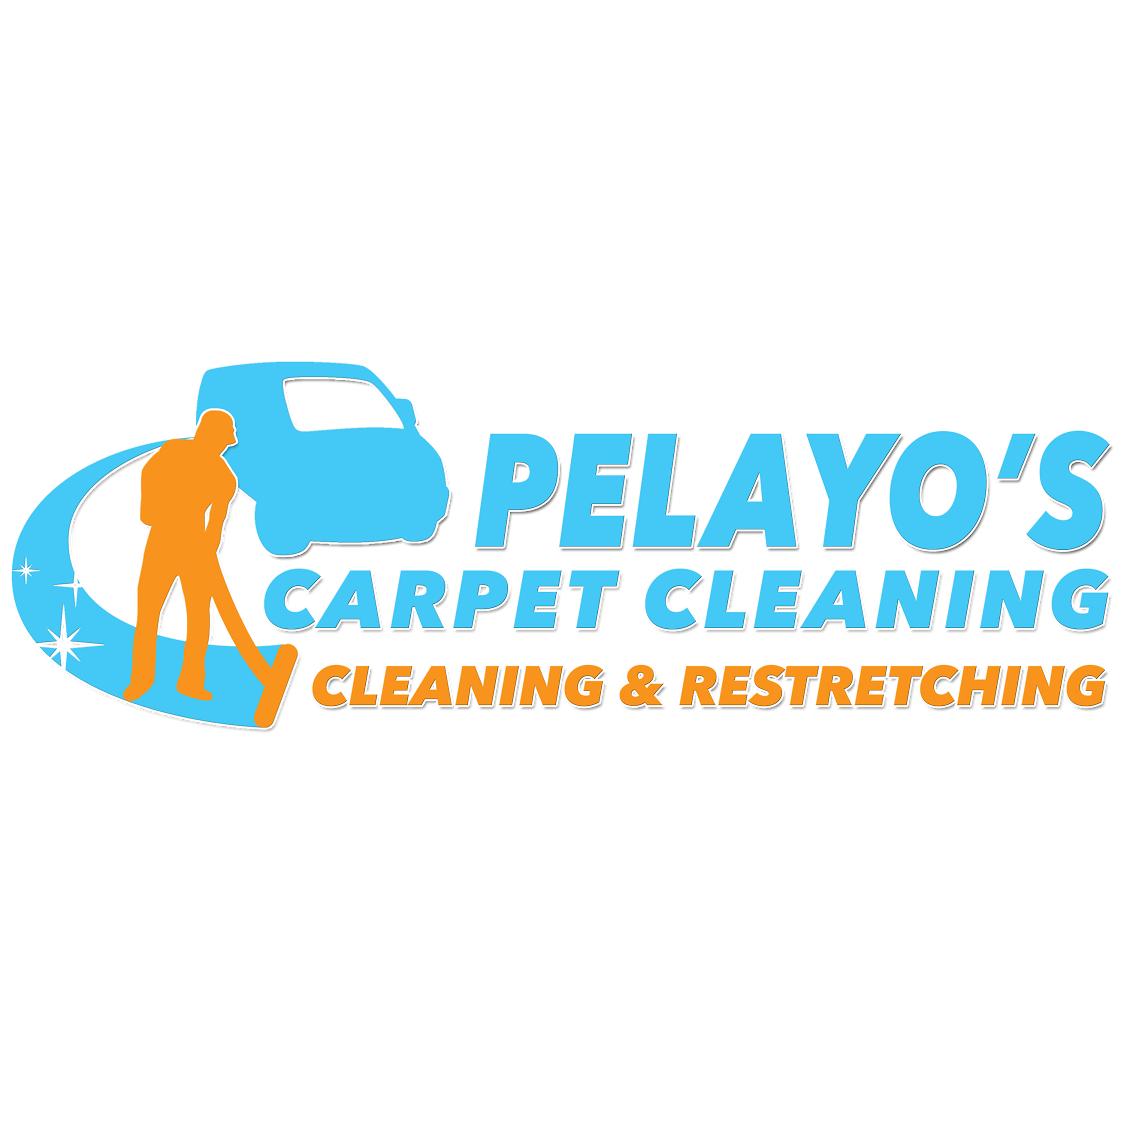 Pelayo's Carpet Cleaning